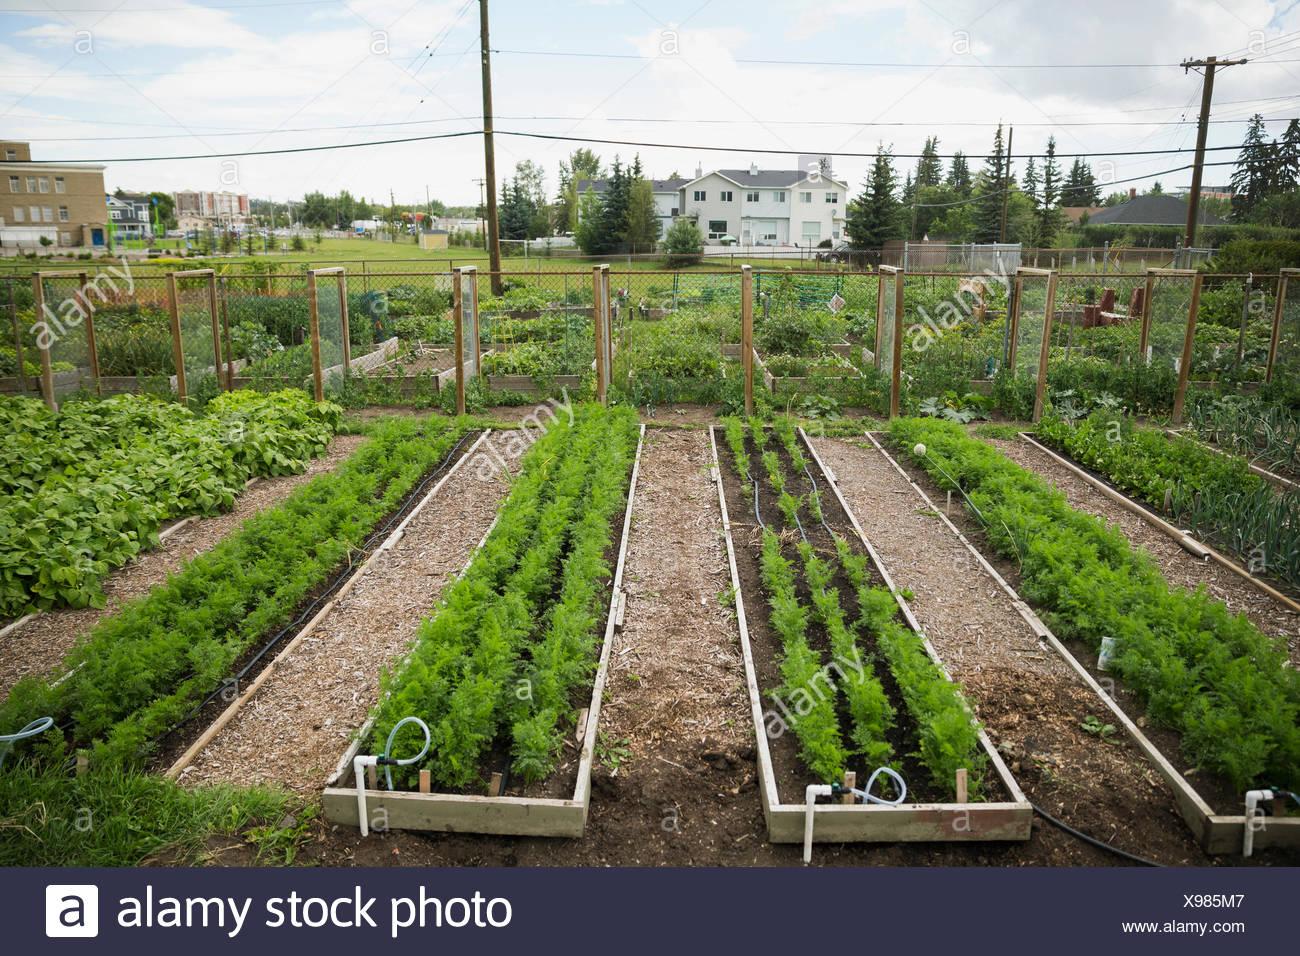 Plants growing in rows in community garden - Stock Image